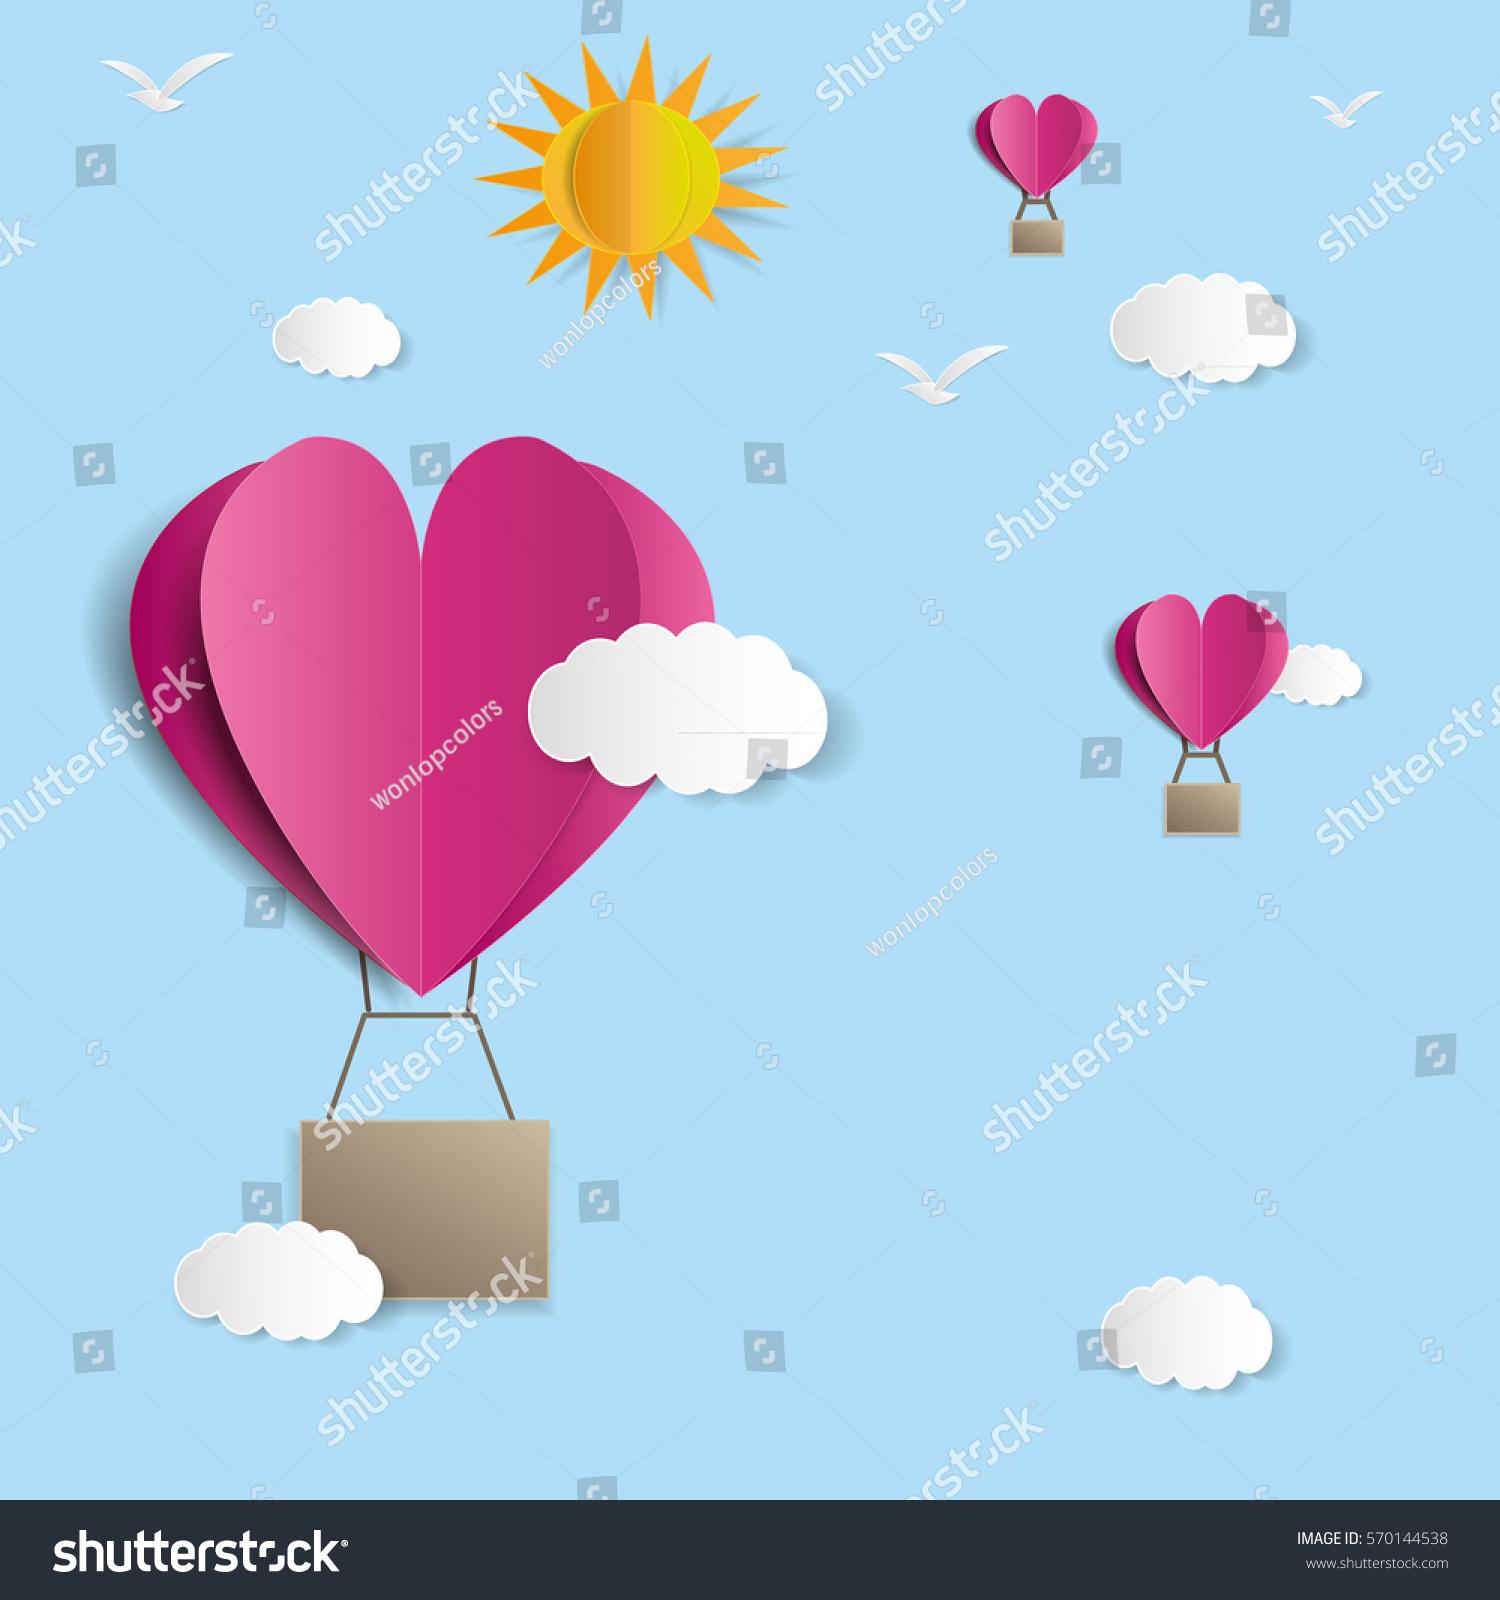 Origami made hot air balloon heart stock vector 570144538 origami made hot air balloon in a heart shape jeuxipadfo Choice Image